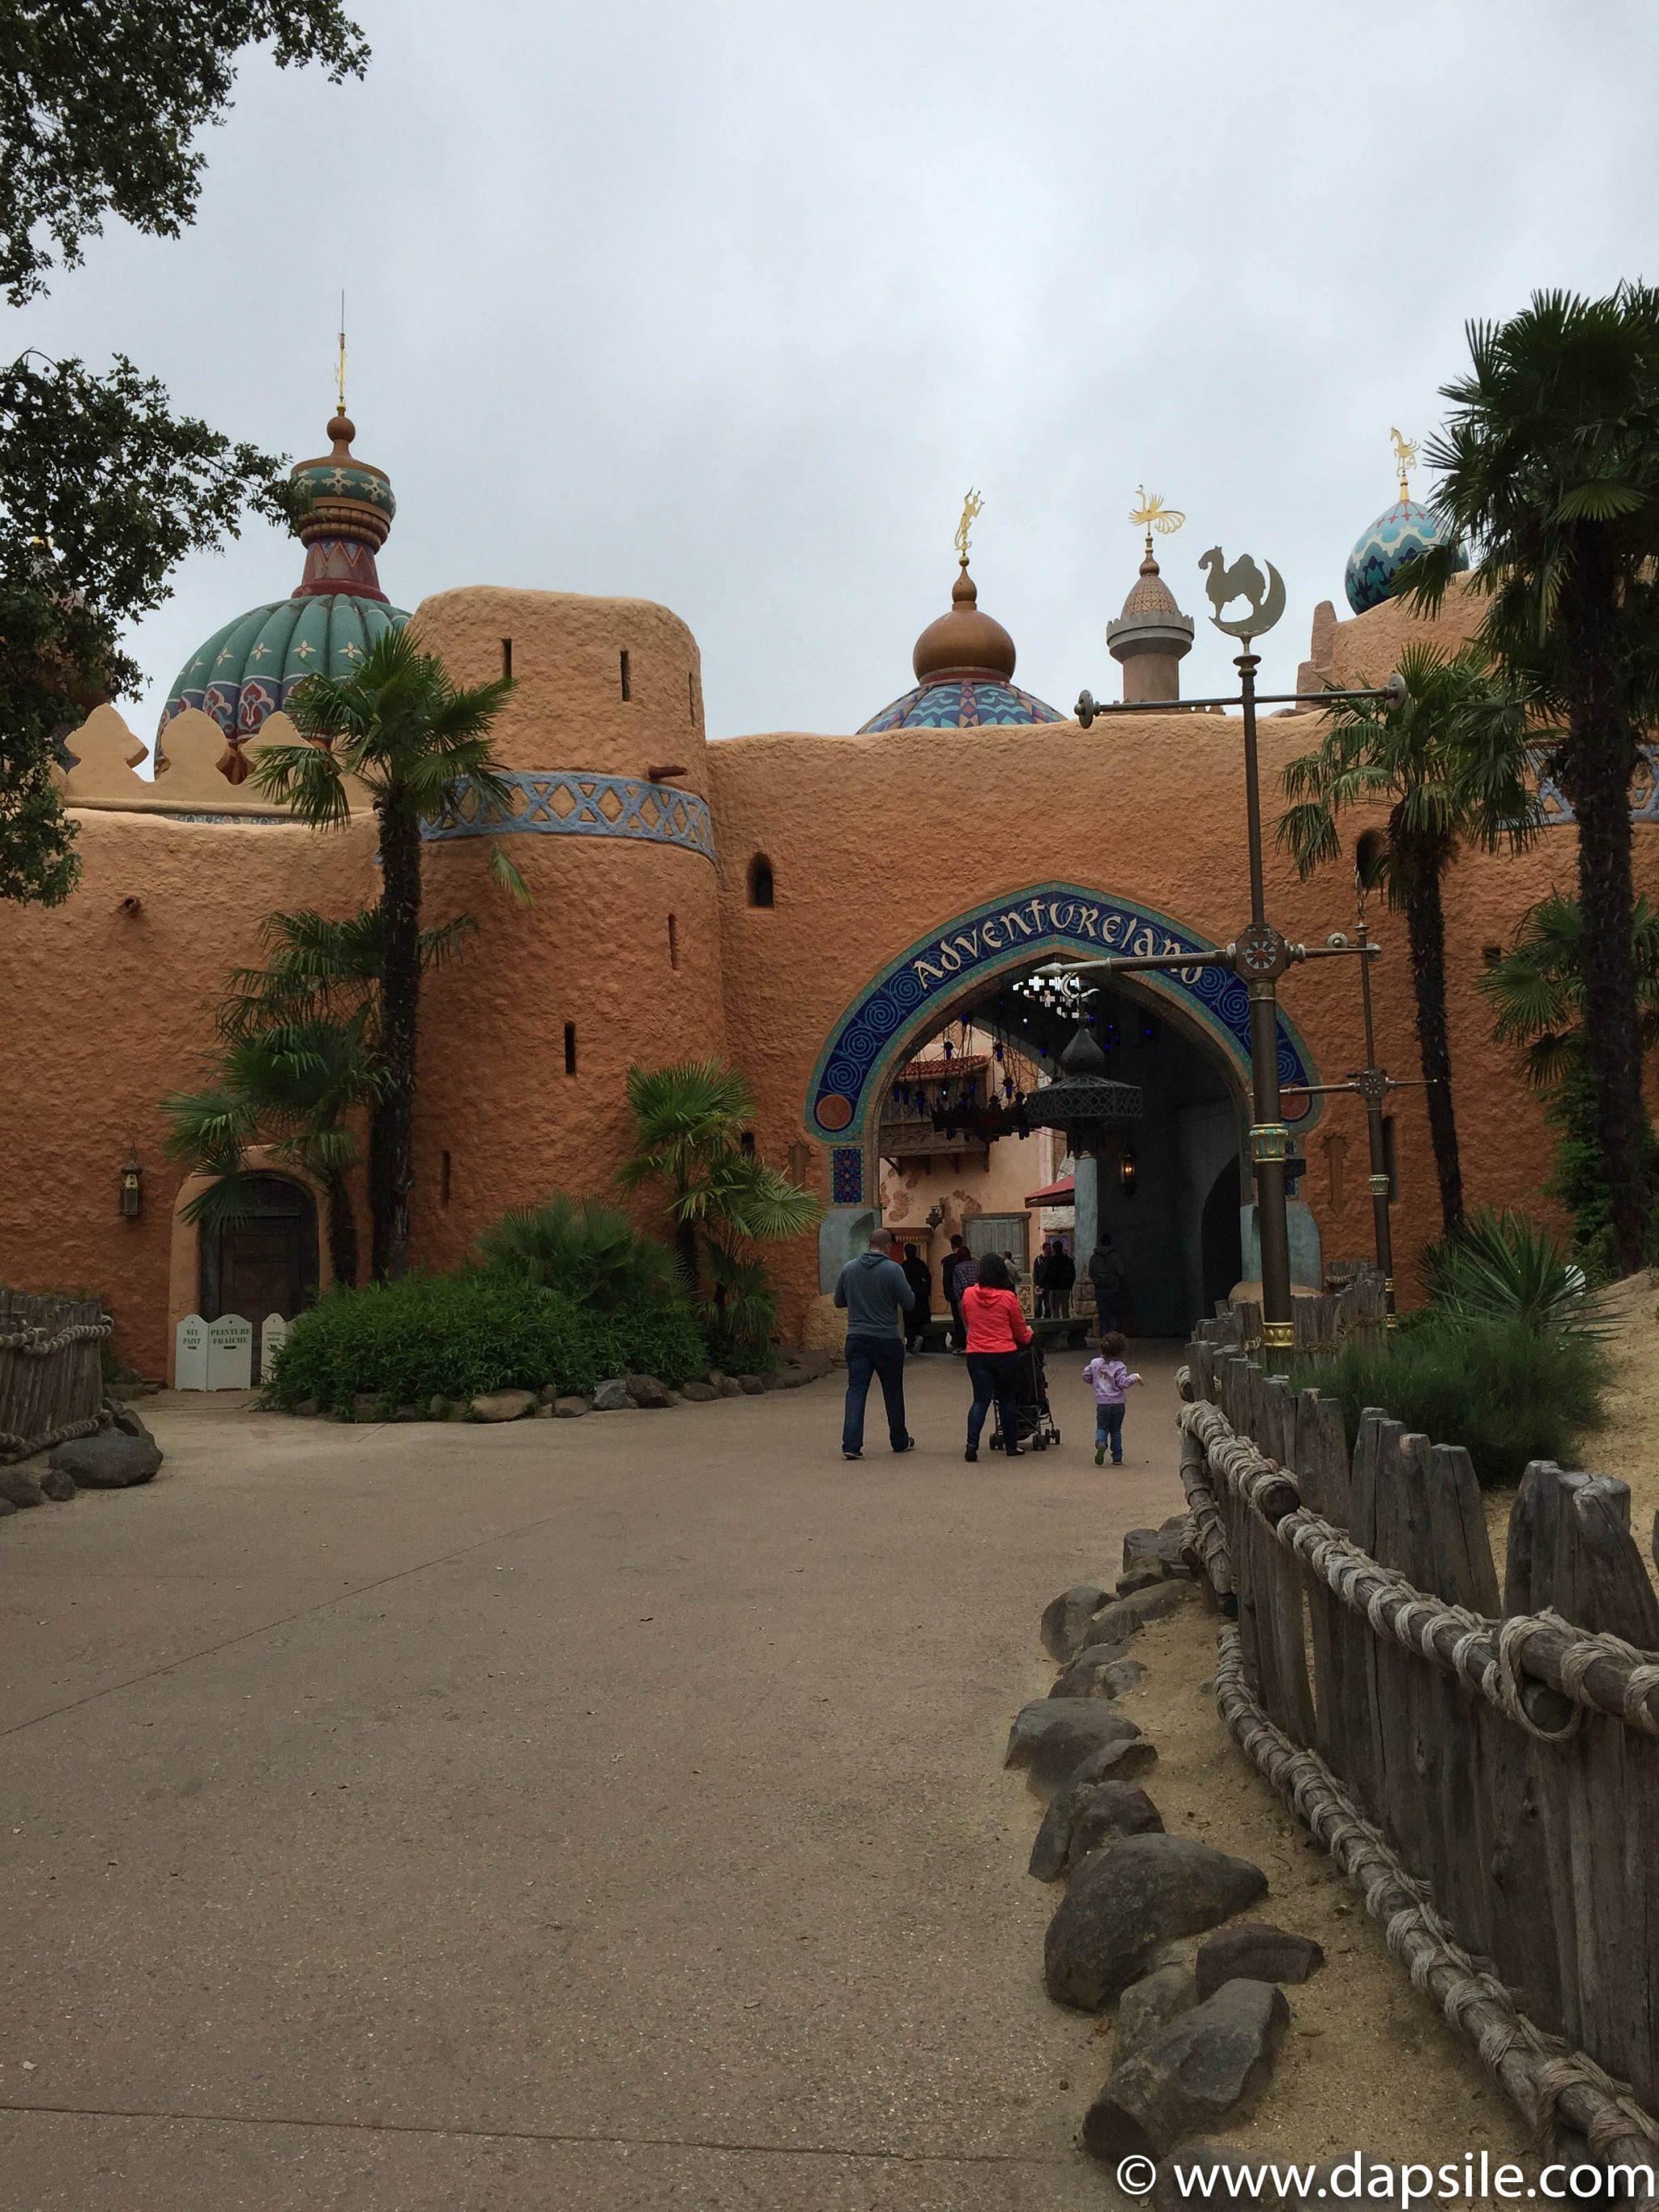 Entrance to Adventureland at Disneyland in Paris Sights